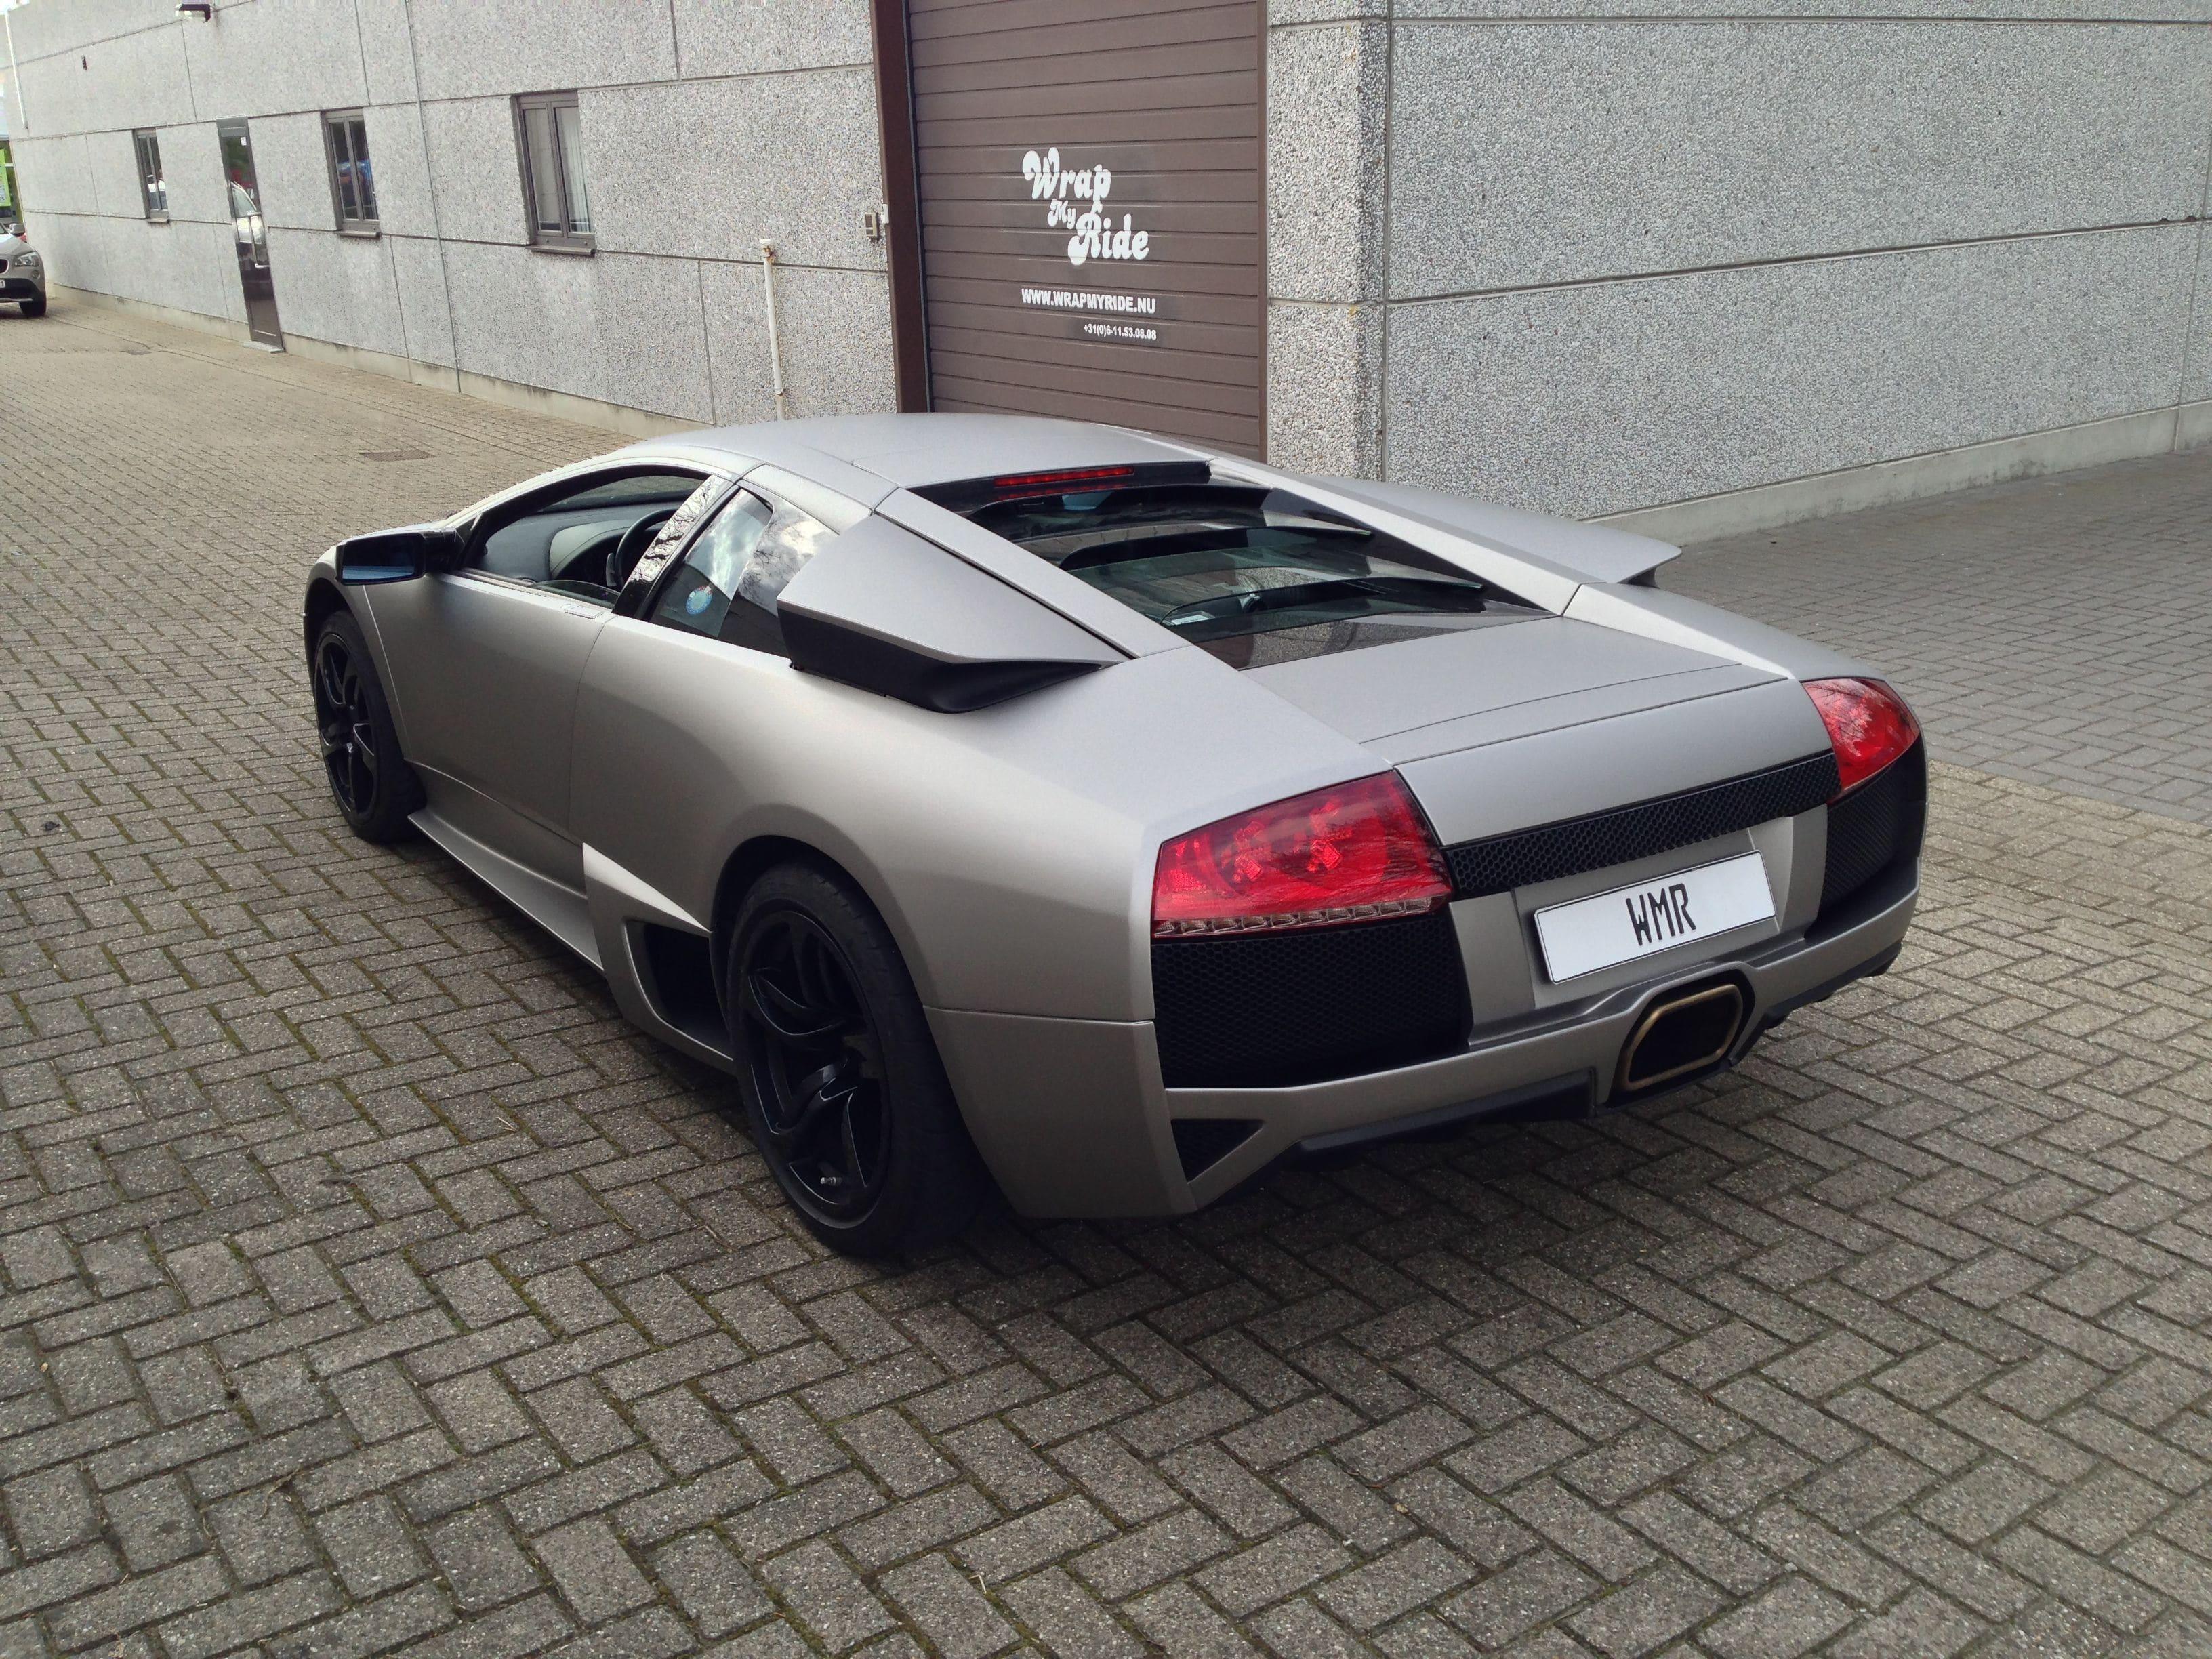 Lamborghini Murcialago LP670 met Gunpowder Wrap, Carwrapping door Wrapmyride.nu Foto-nr:5990, ©2021